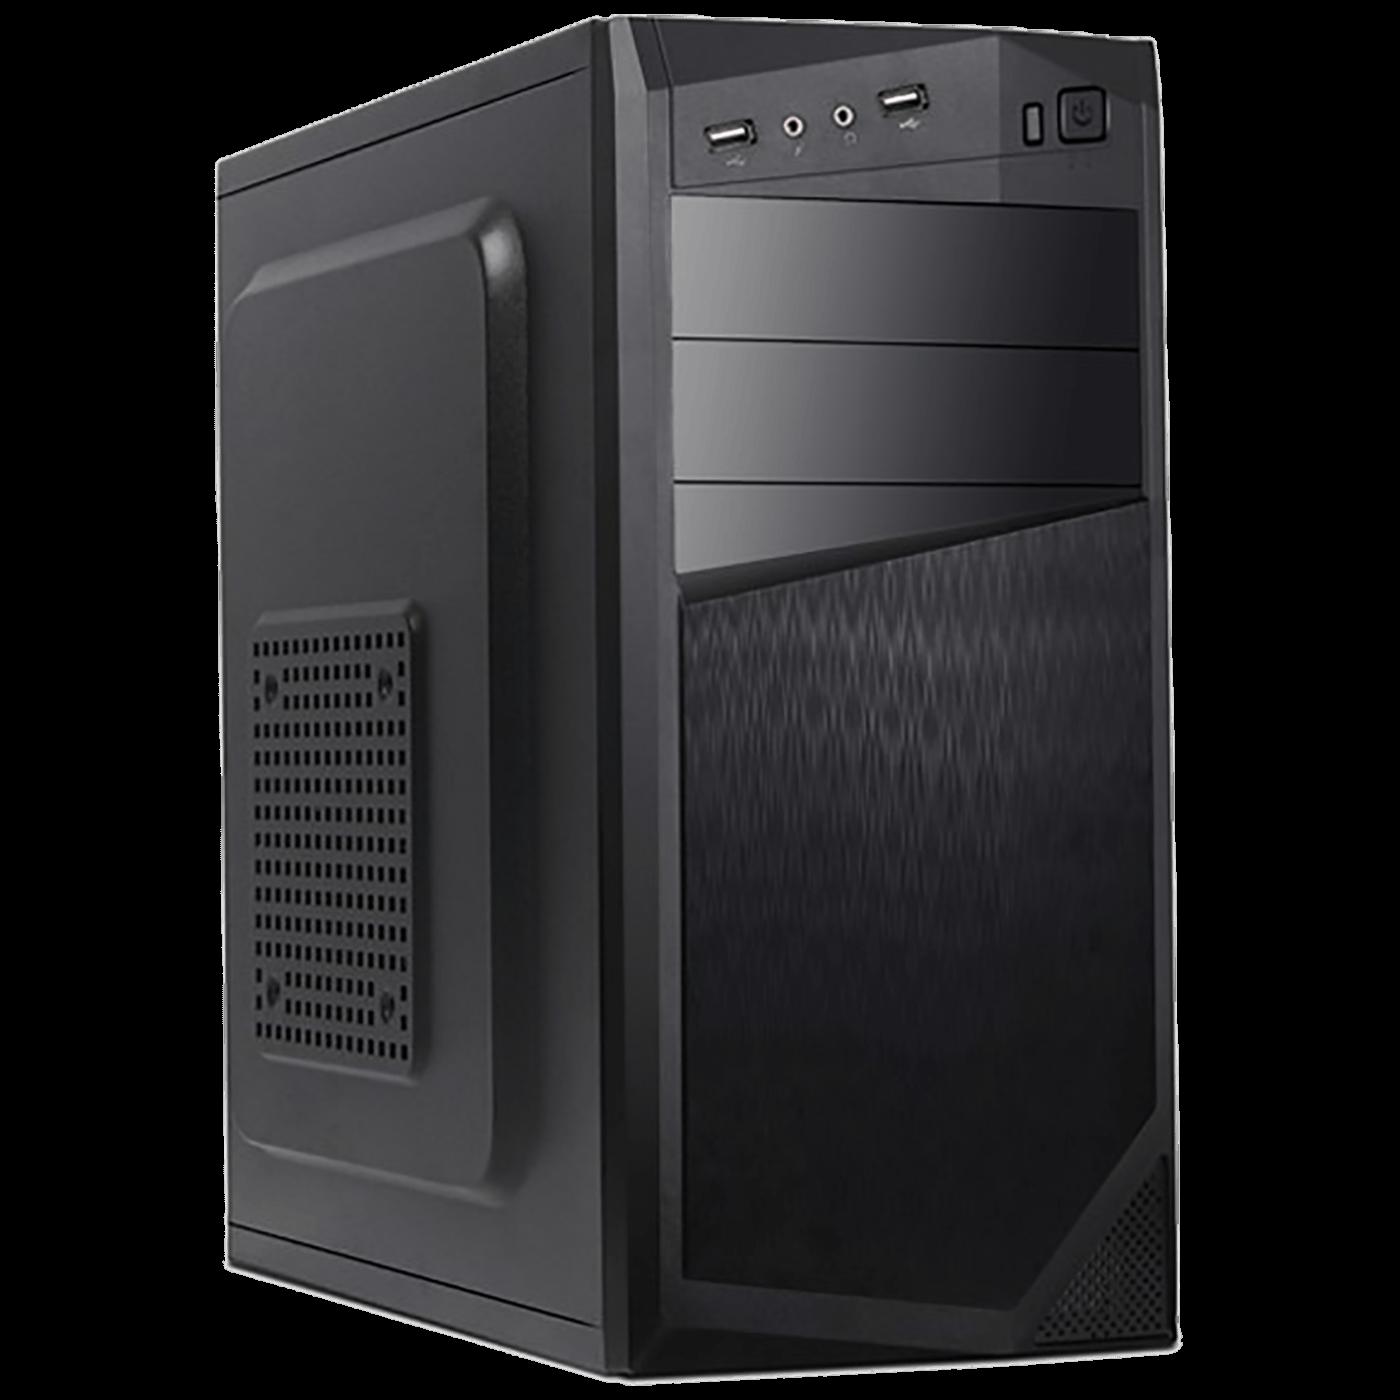 Desktop PC, Intel i5-10400 2.9GHz,RAM 8GB,SSD 256GB,HDD 1TB